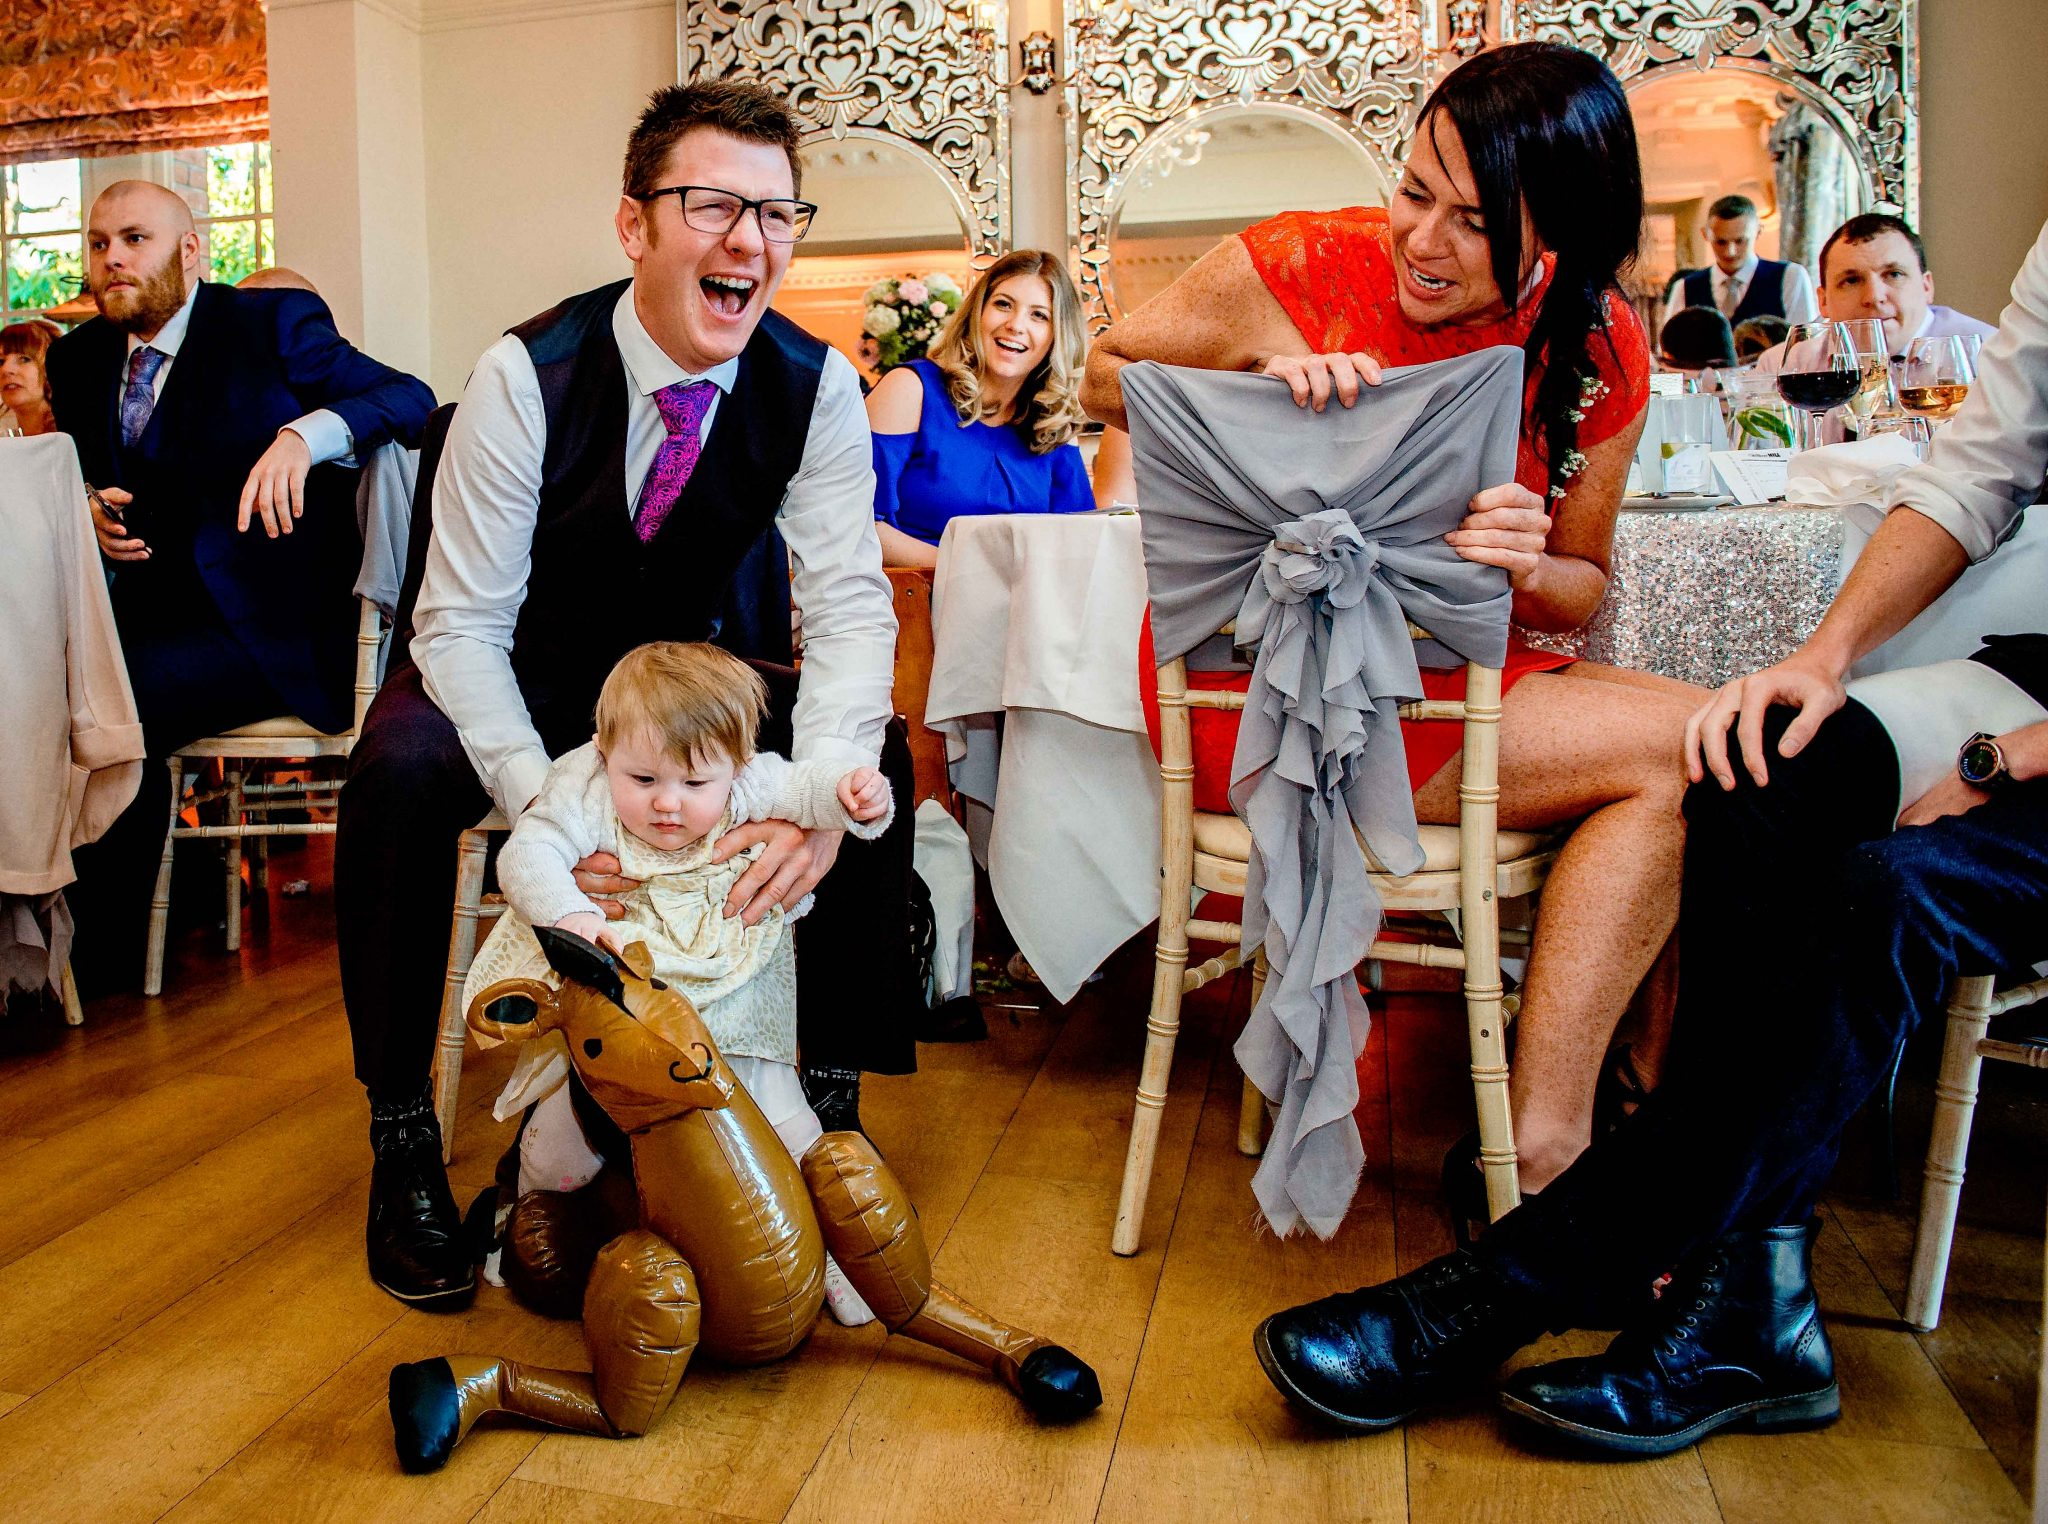 Southport-Liverpool-Lancashire-North-West-Wedding-Photographer-Ollie-Gyte-Wedding-Photography-Weddings-Image-002